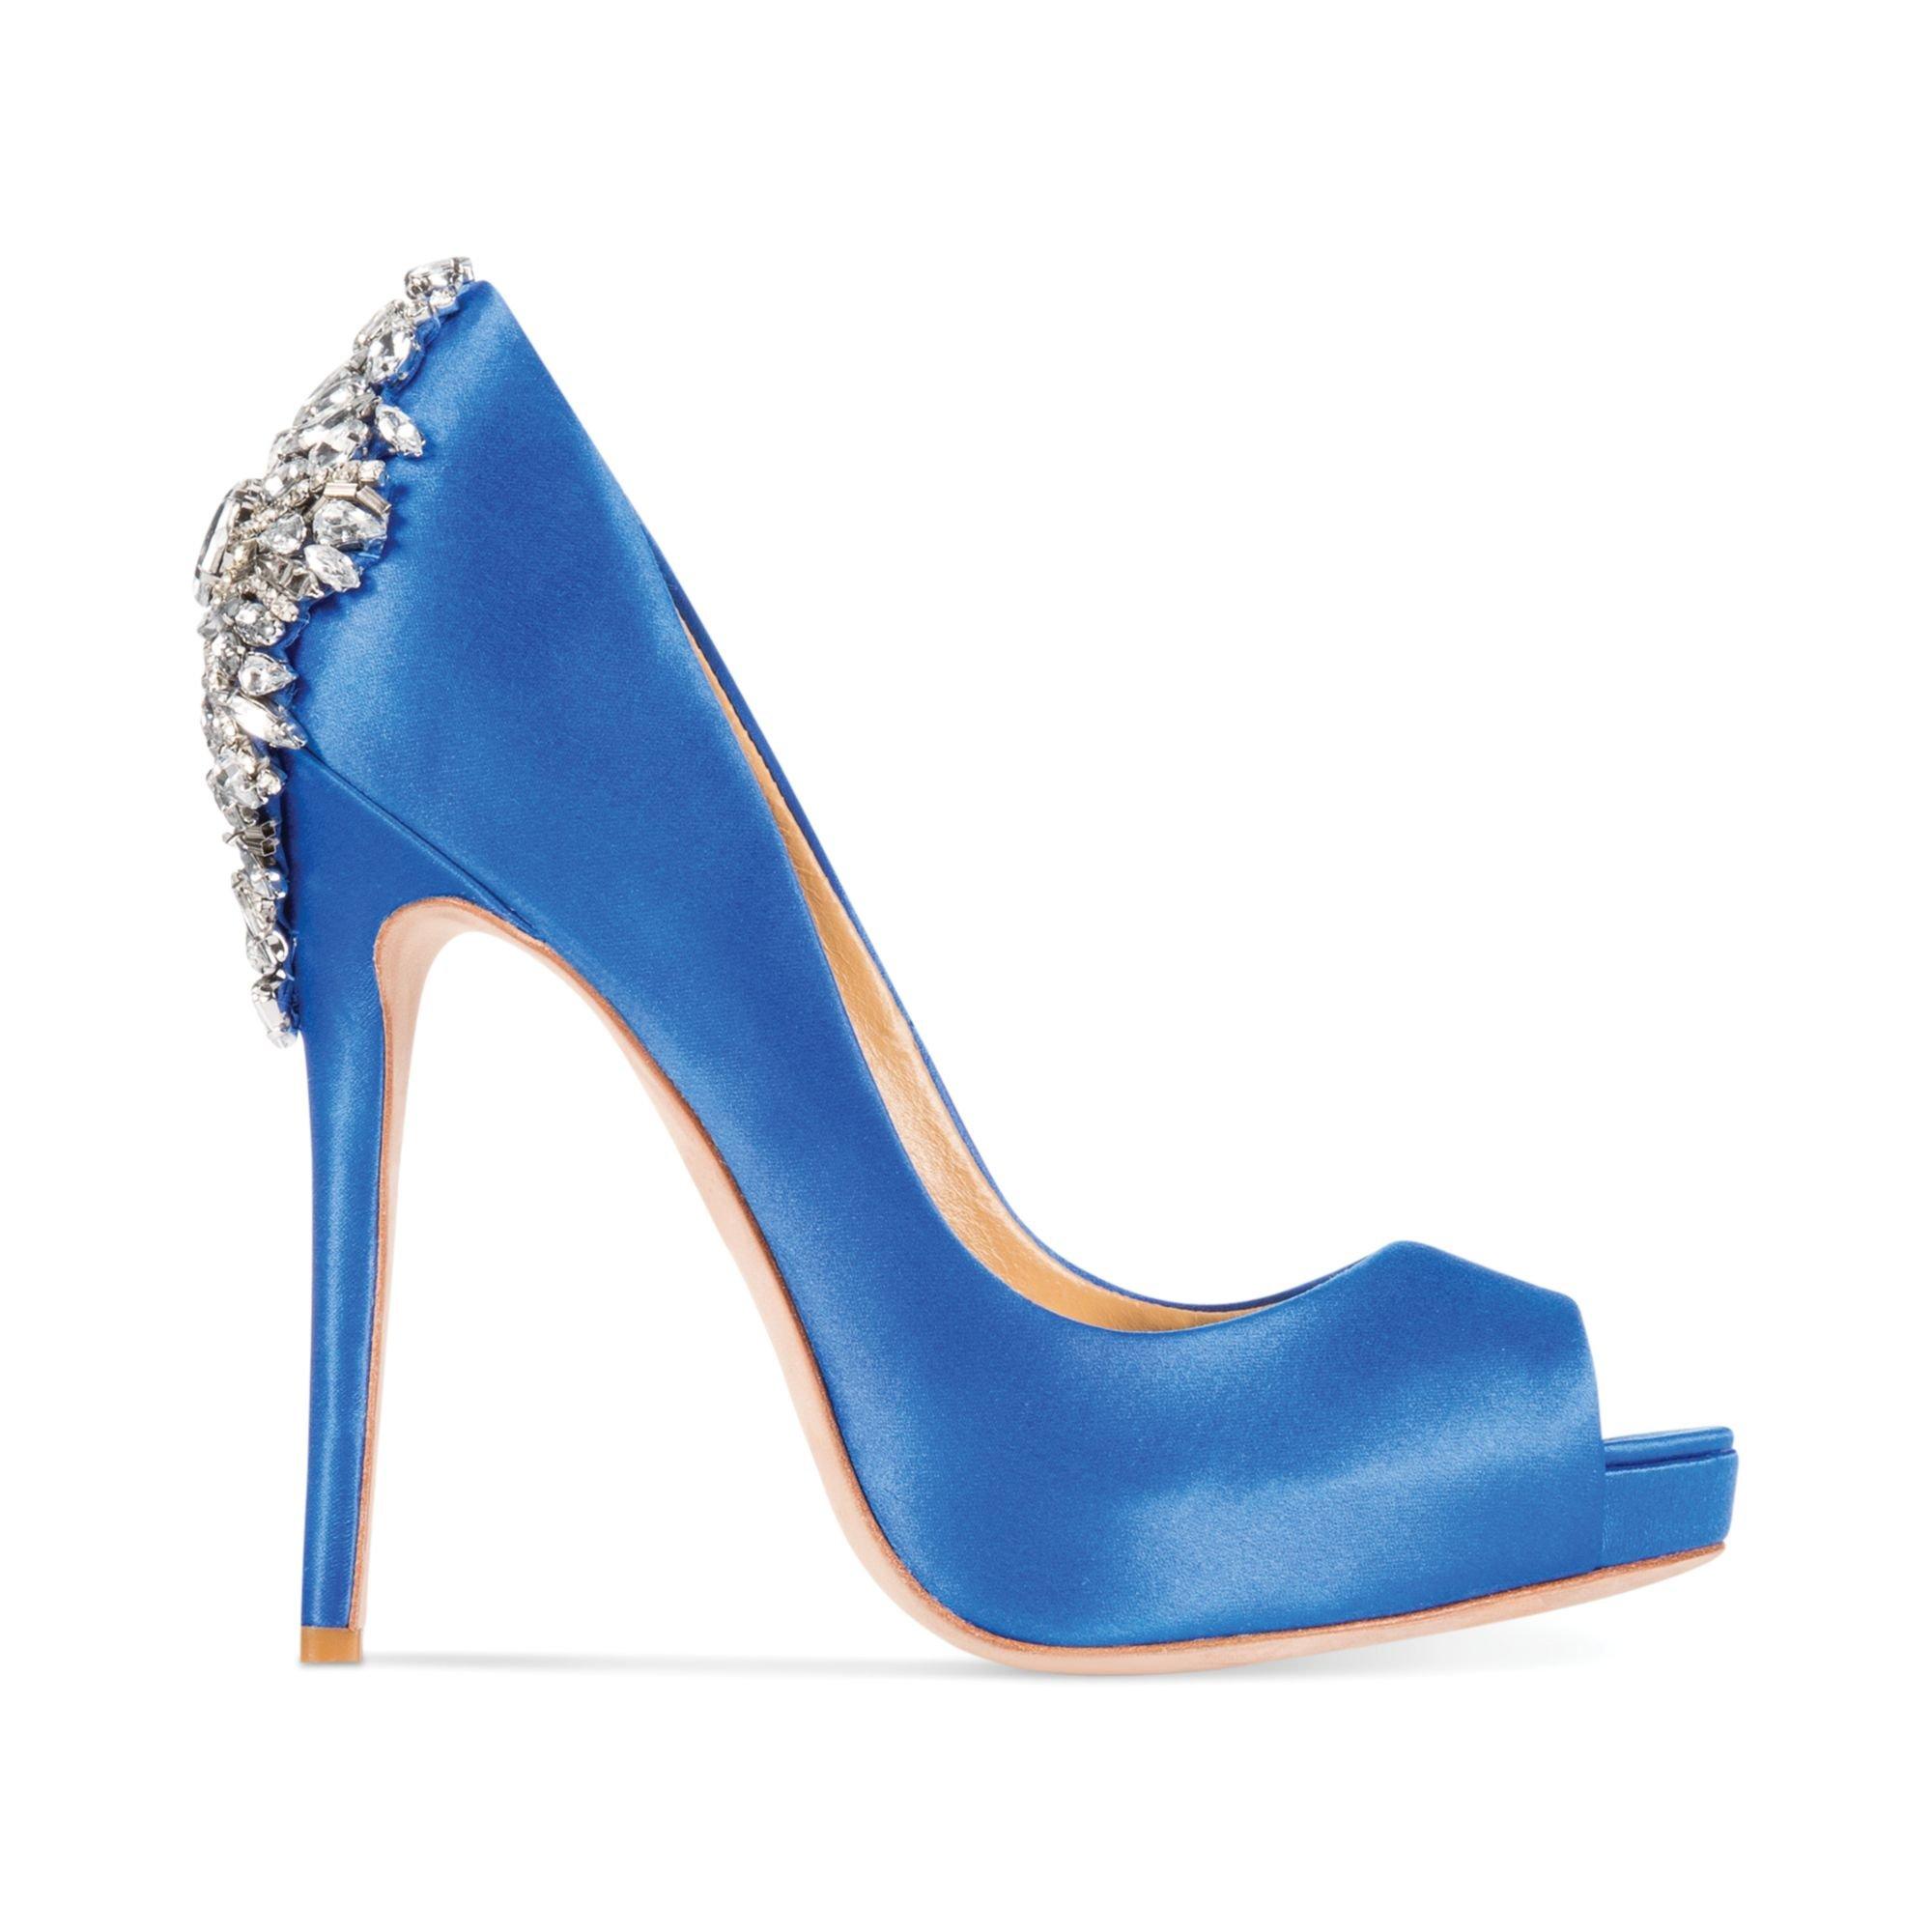 Badgley Mischka Shoes Royal Blue